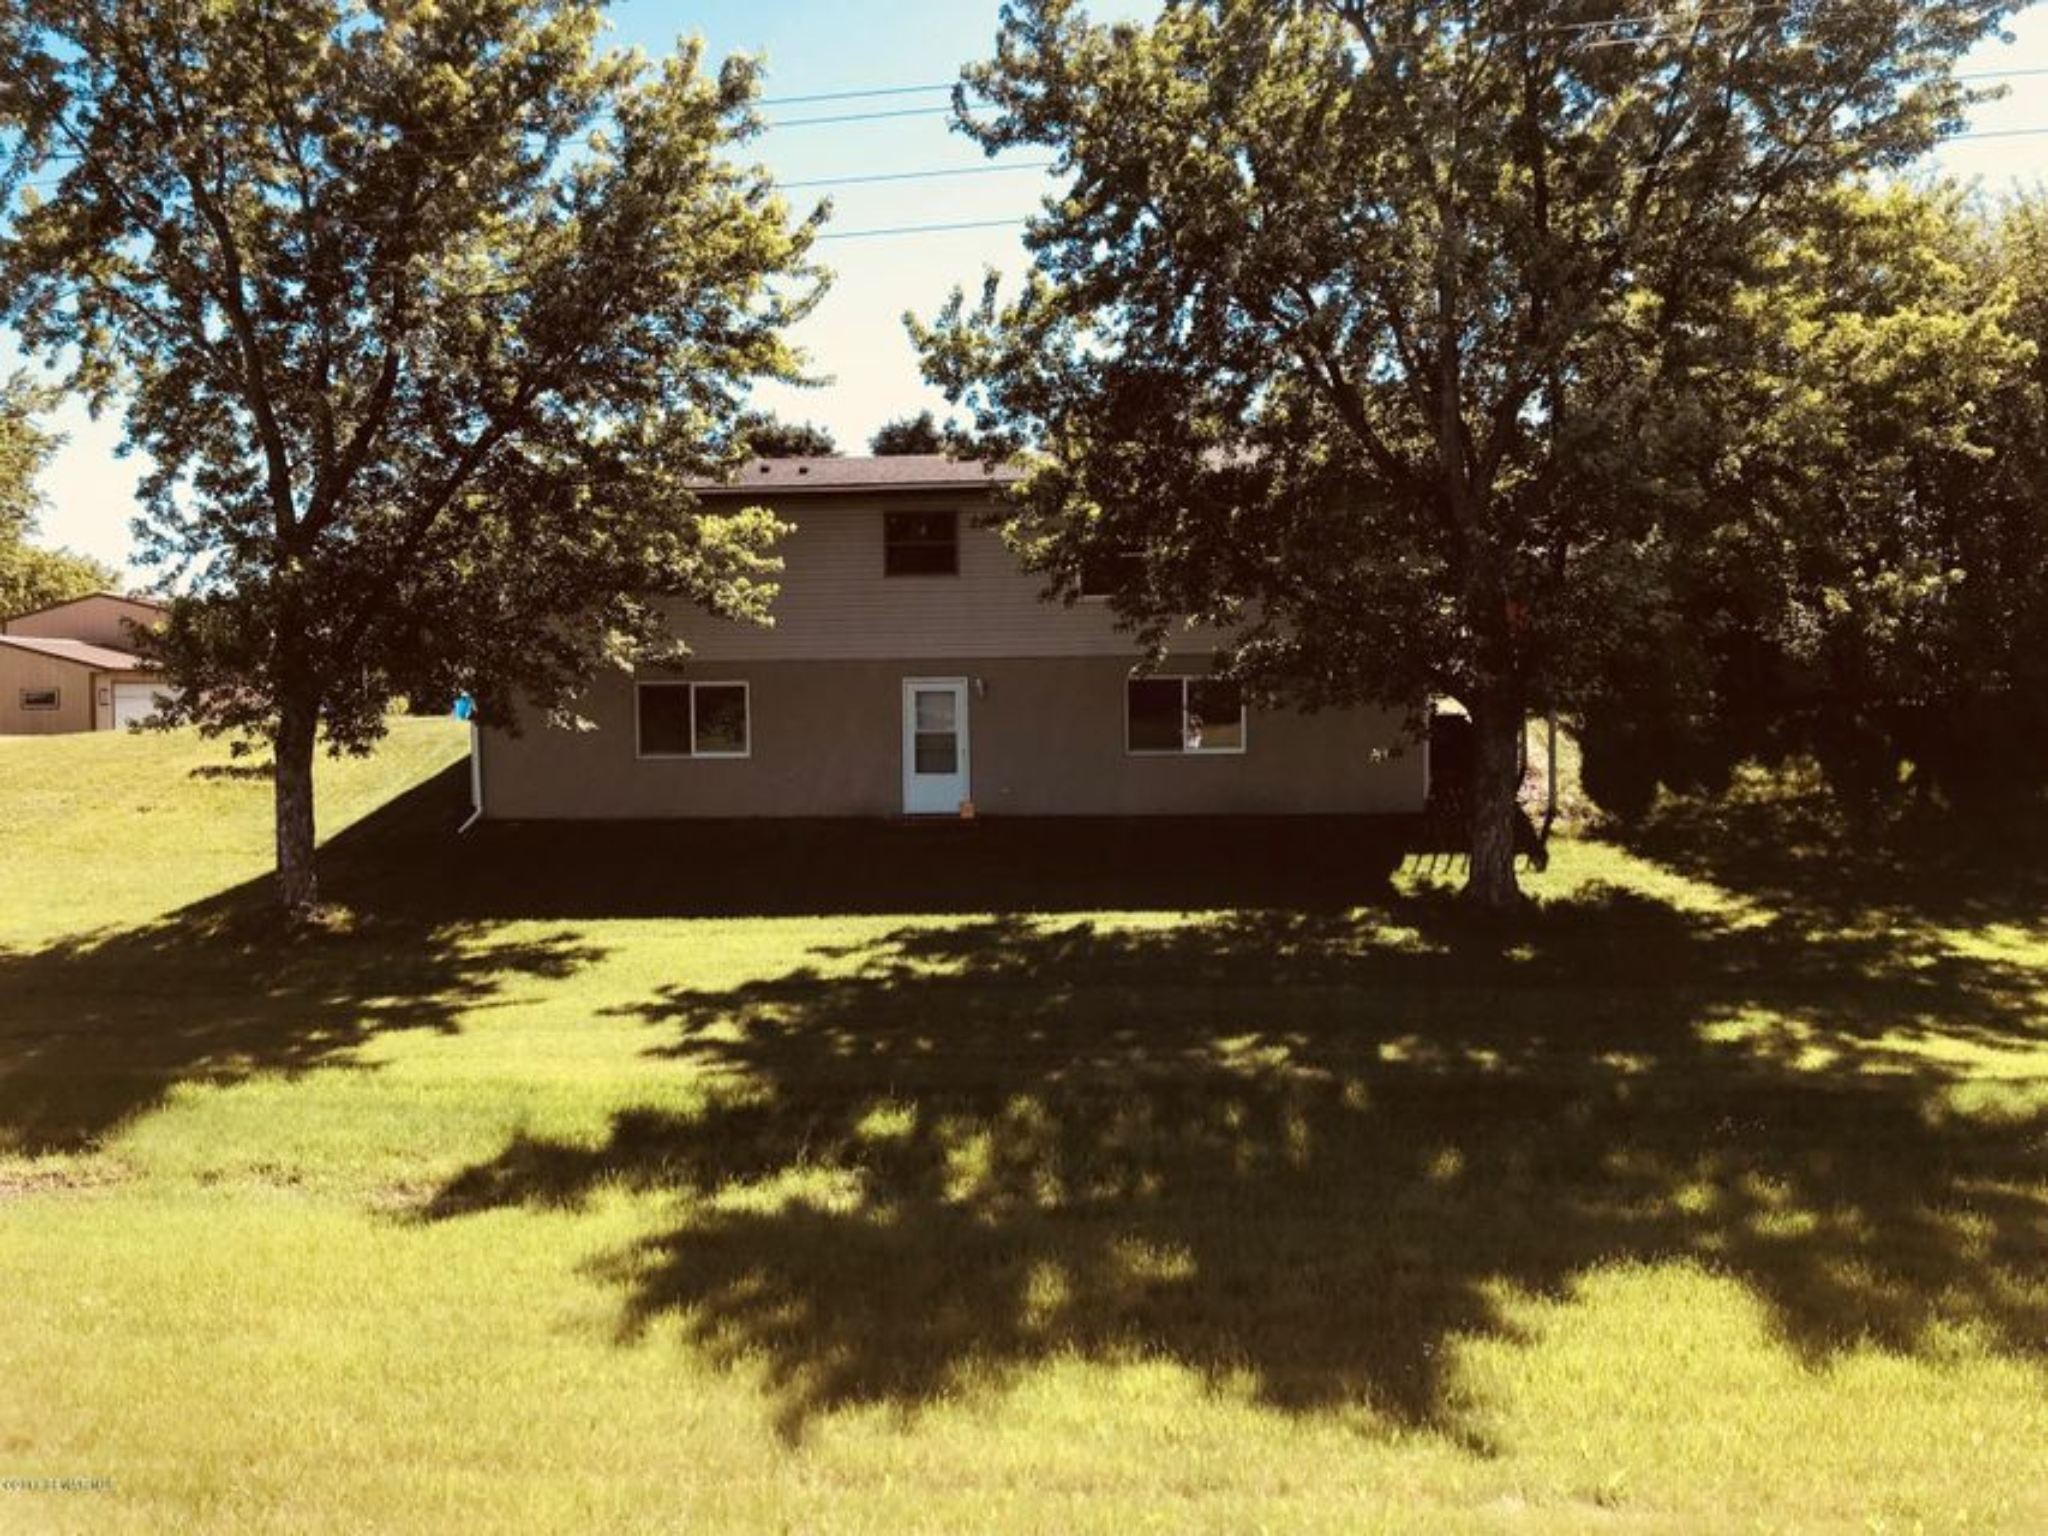 57928 Highway 63 Zumbro Falls, MN 55991 - MLS #: 4089213